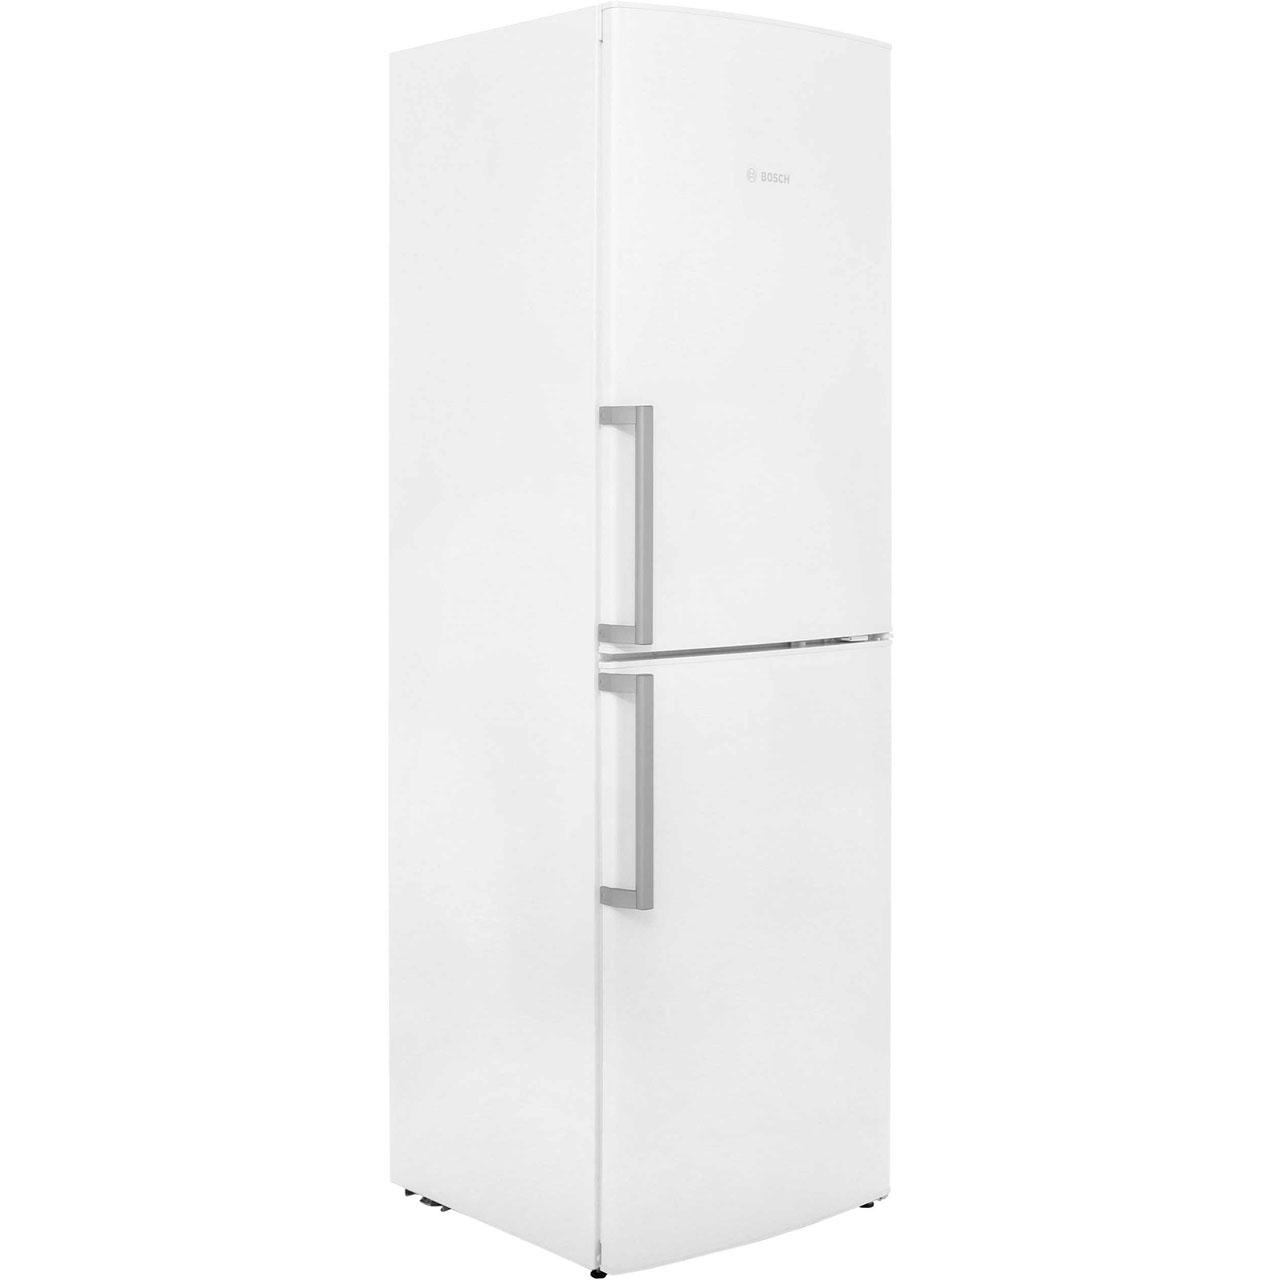 Image of Bosch Serie 4 KGN34VW26G Free Standing Fridge Freezer Frost Free in White